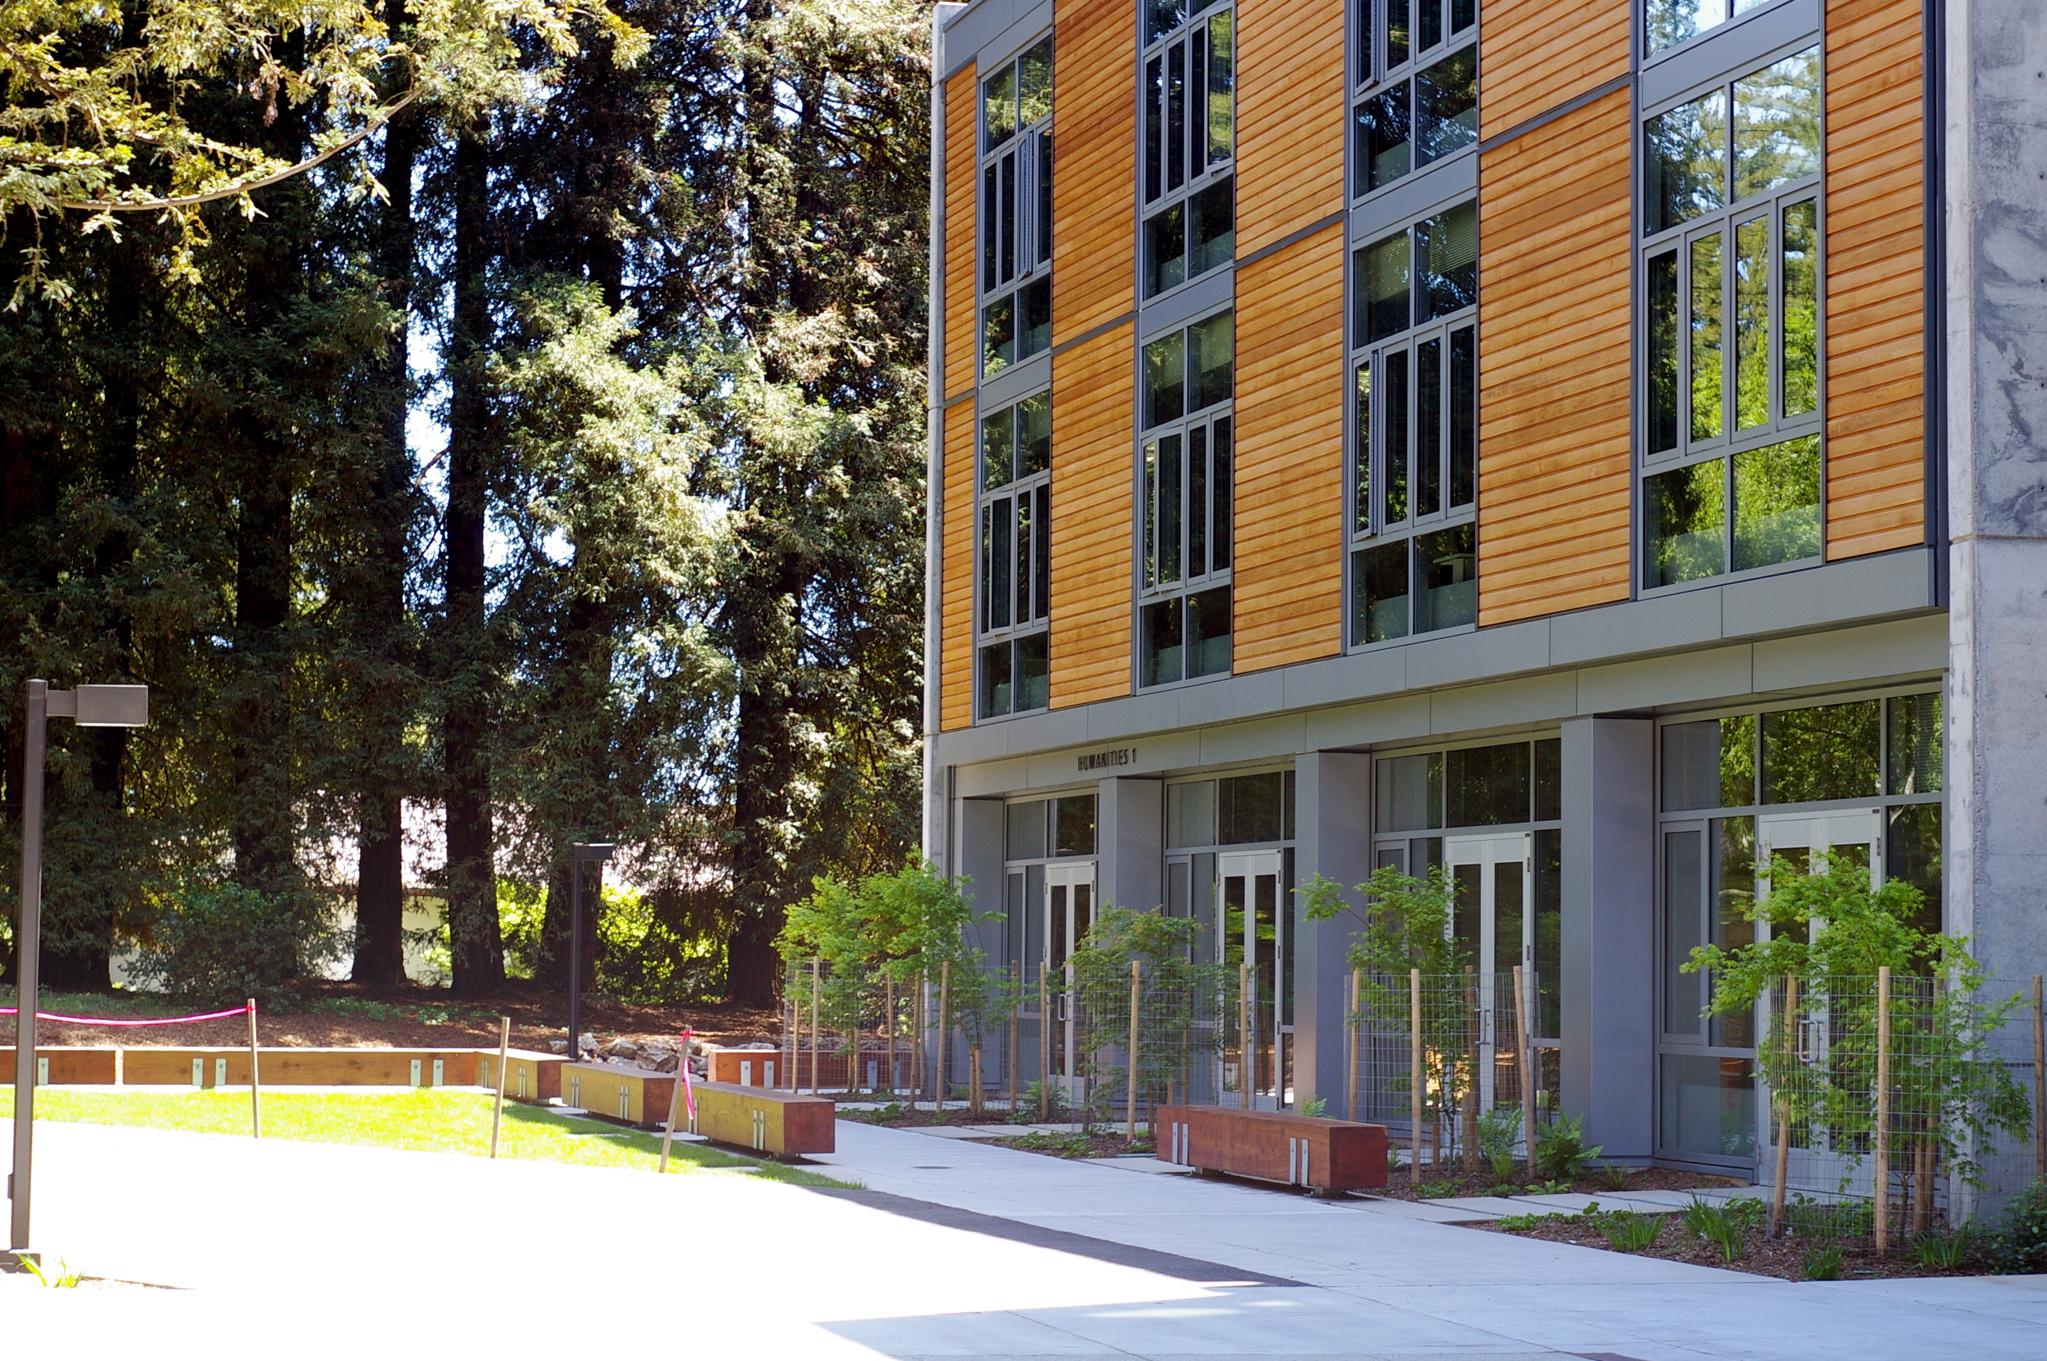 Uc Santa Cruz Feminist Studies